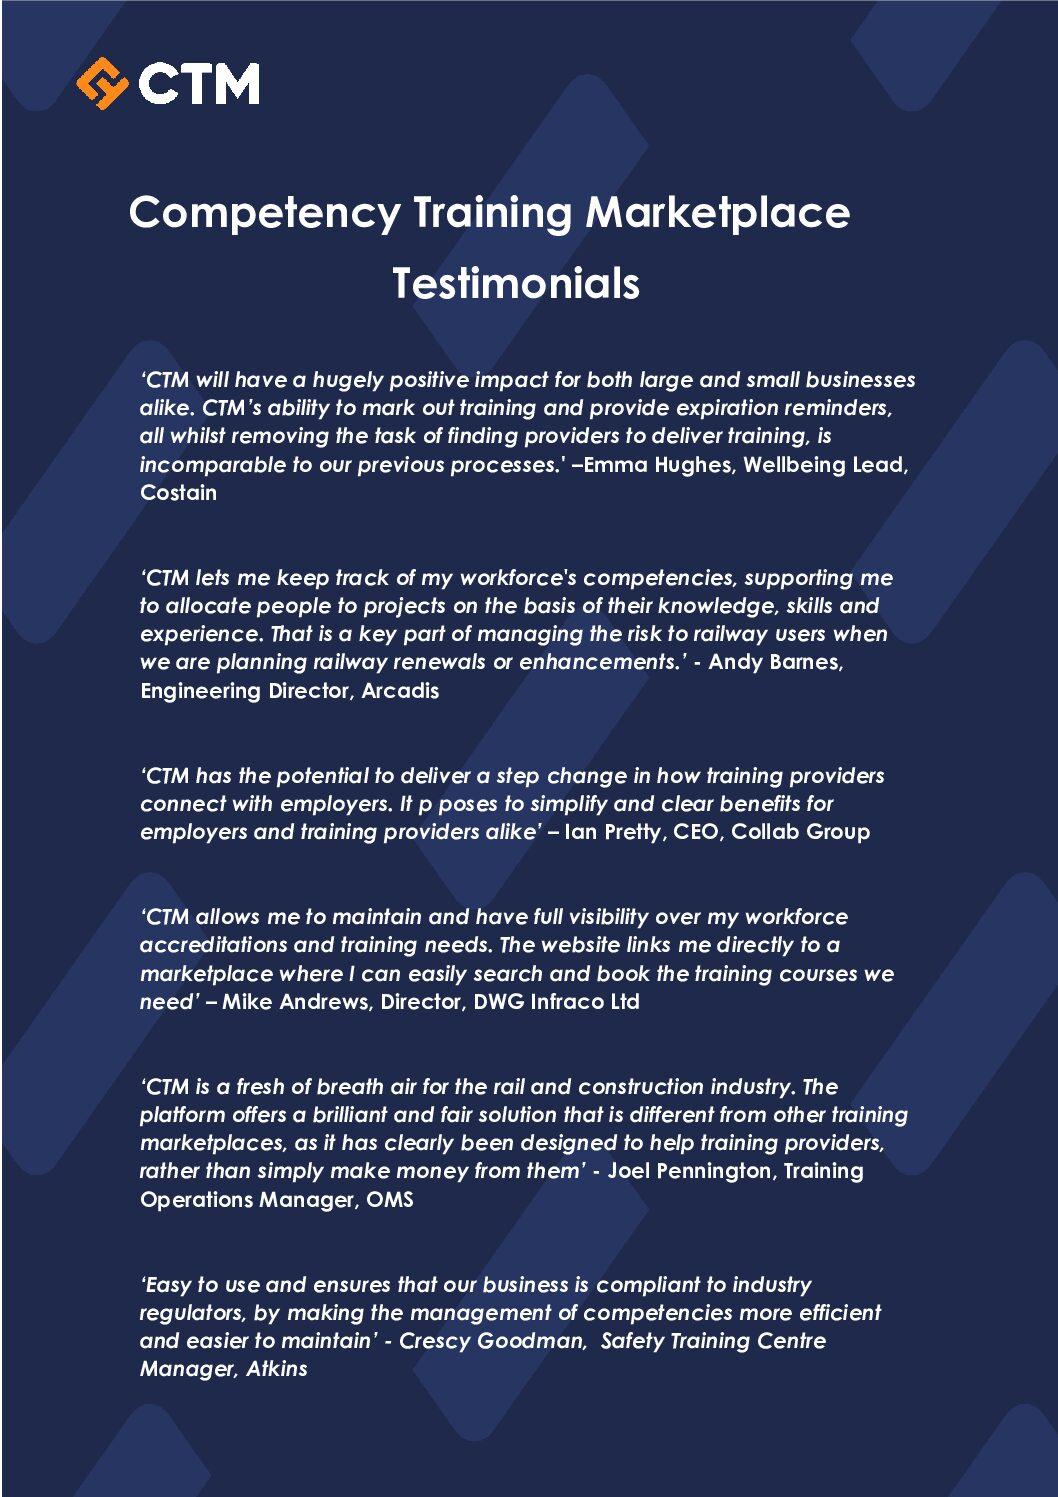 Competency Training Marketplace Testimonials